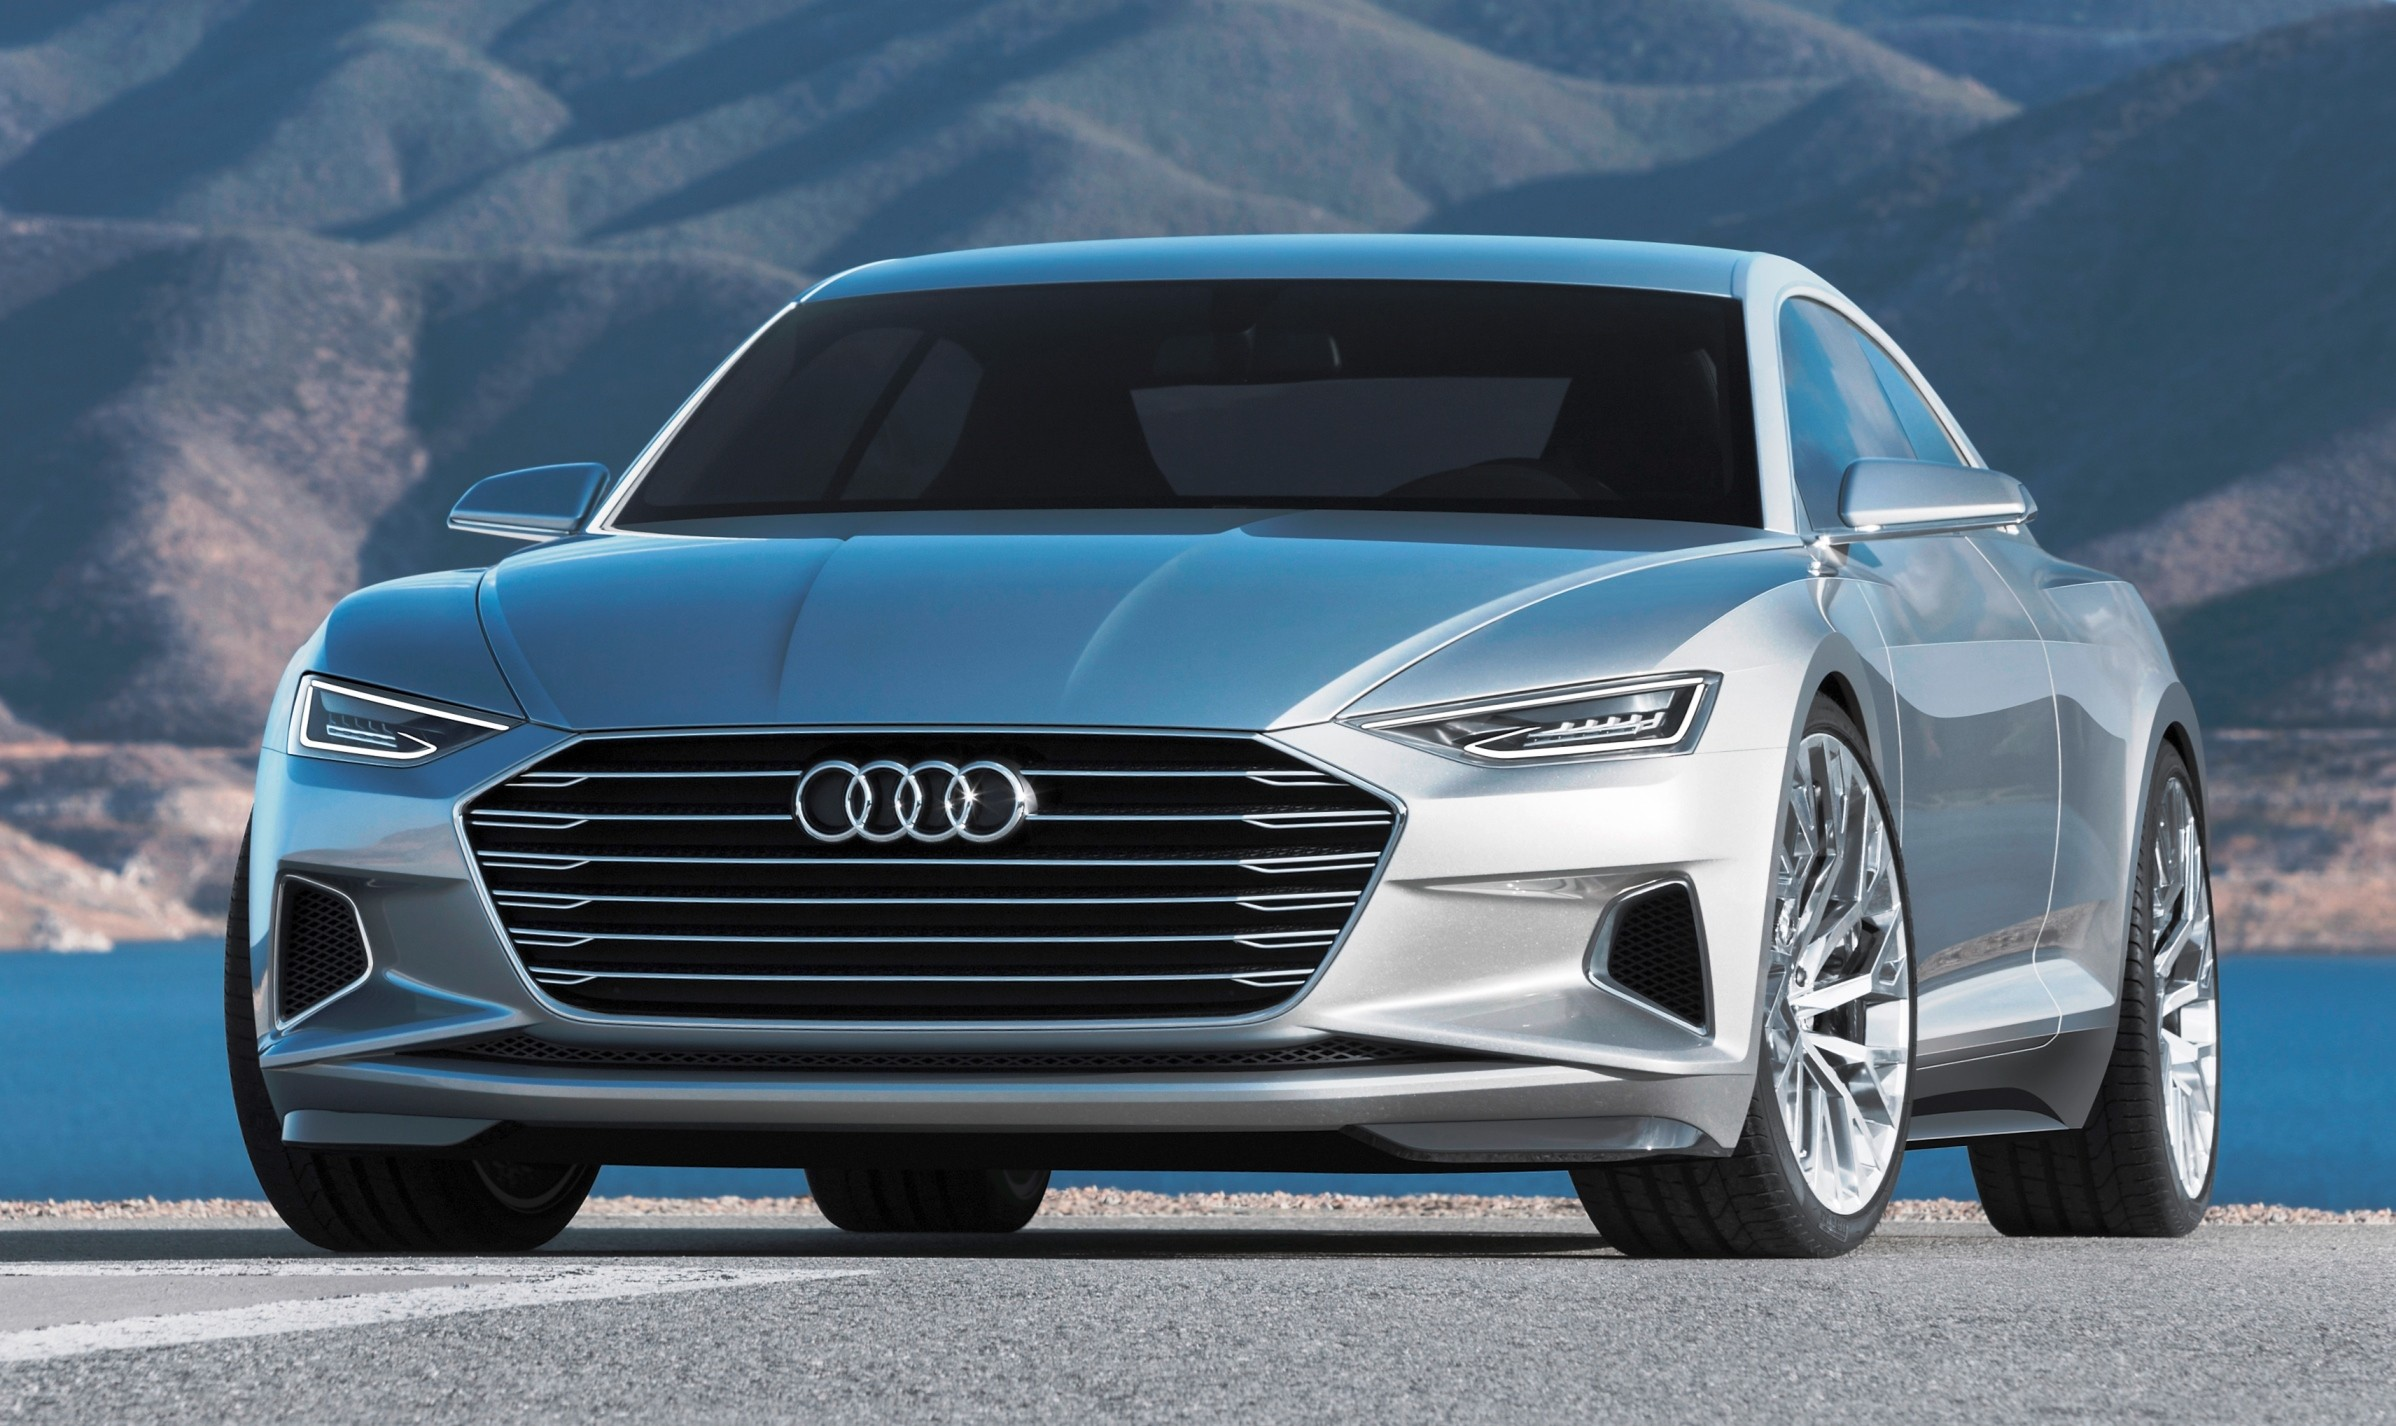 2014 Audi Prologue is Worst of LA 2014 20